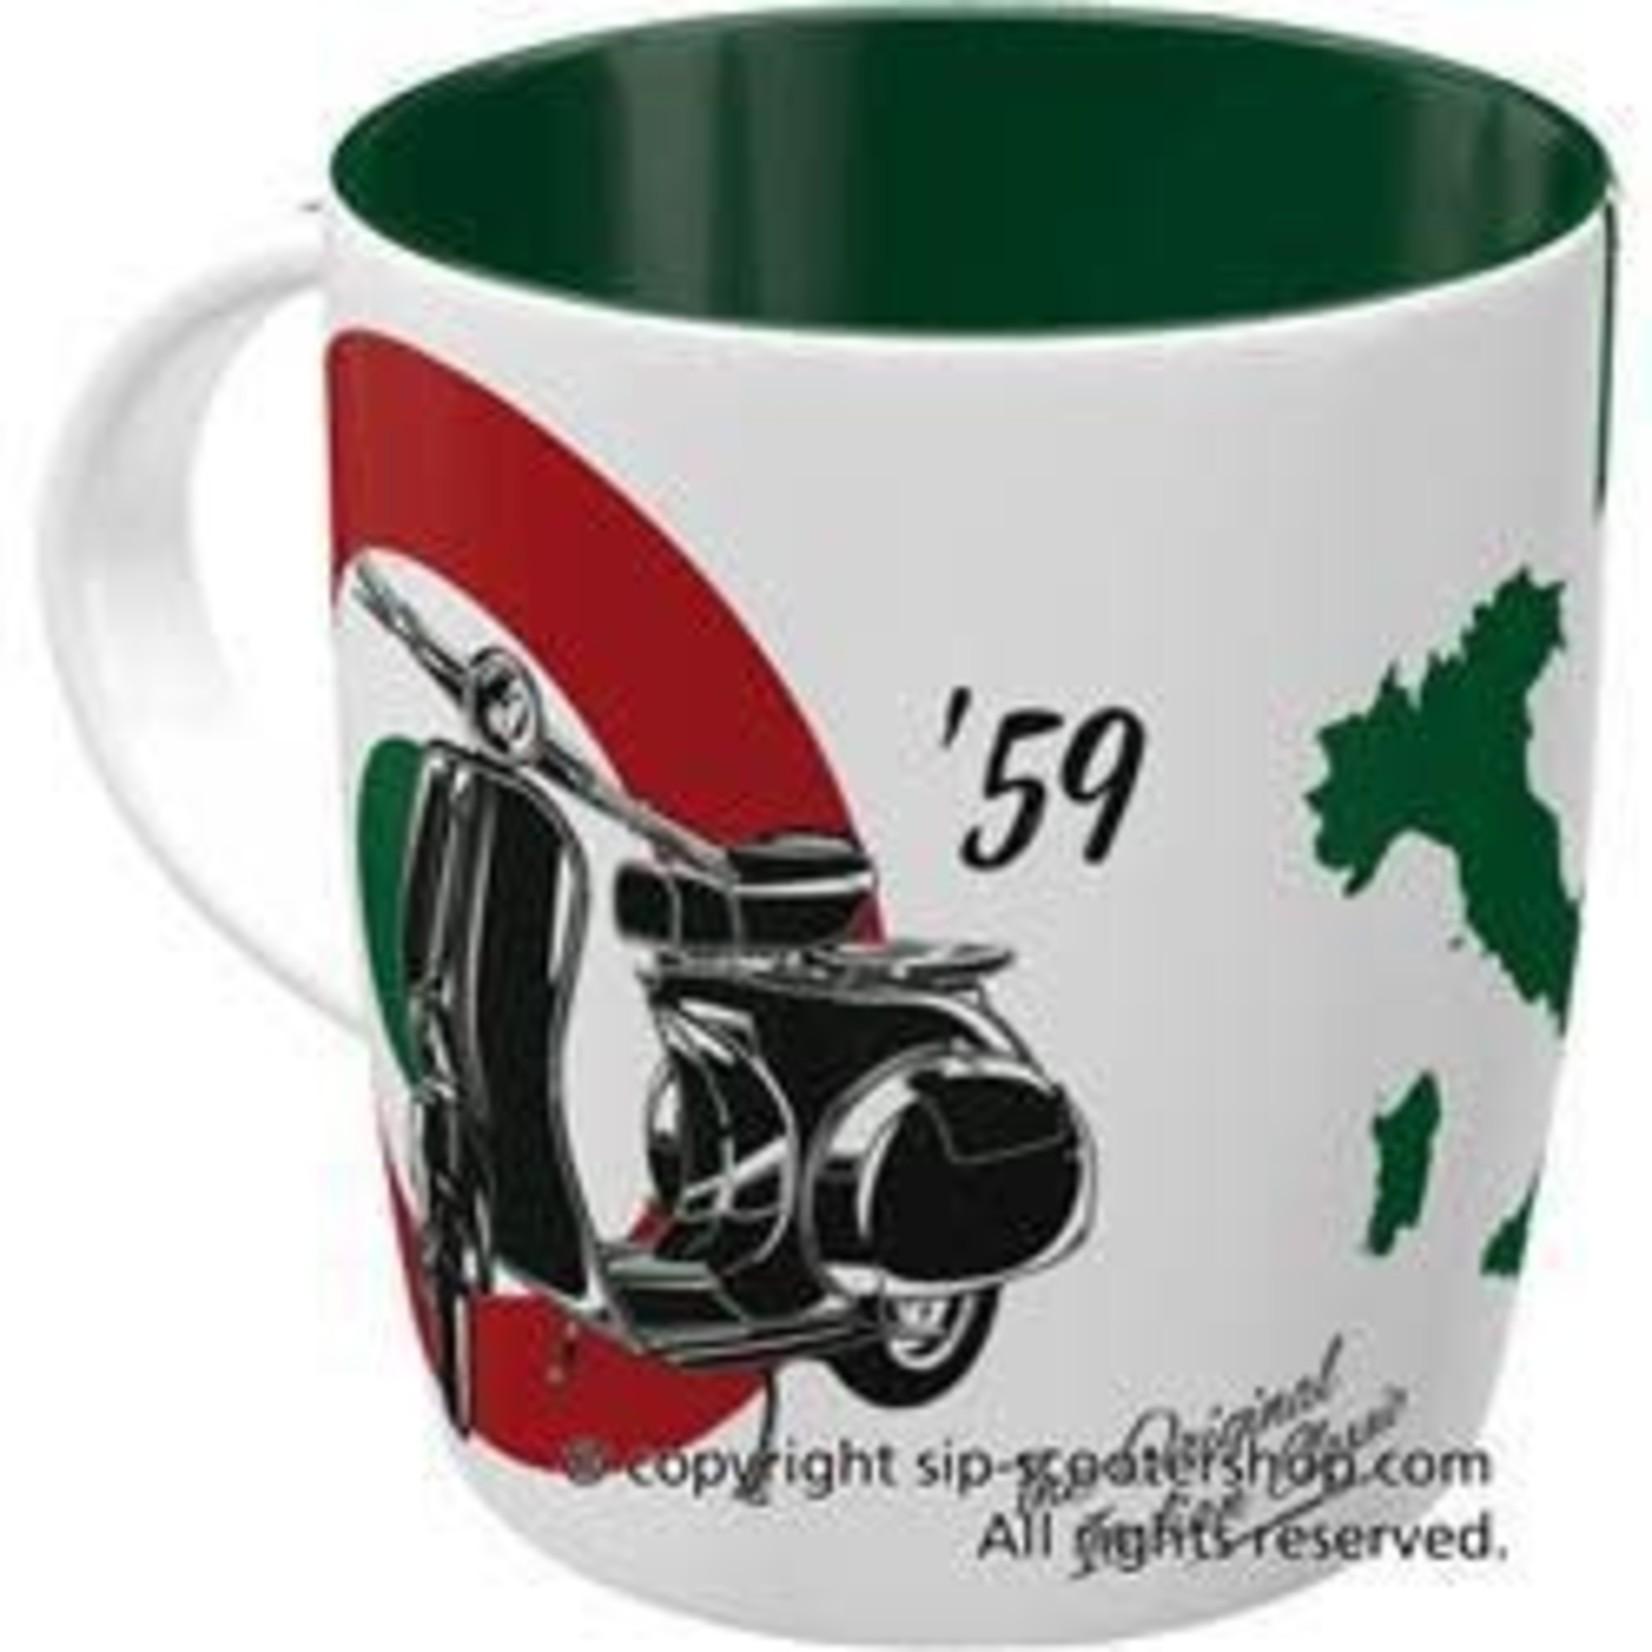 Lifestyle Mug, Vespa The Italian Classic Ceramic